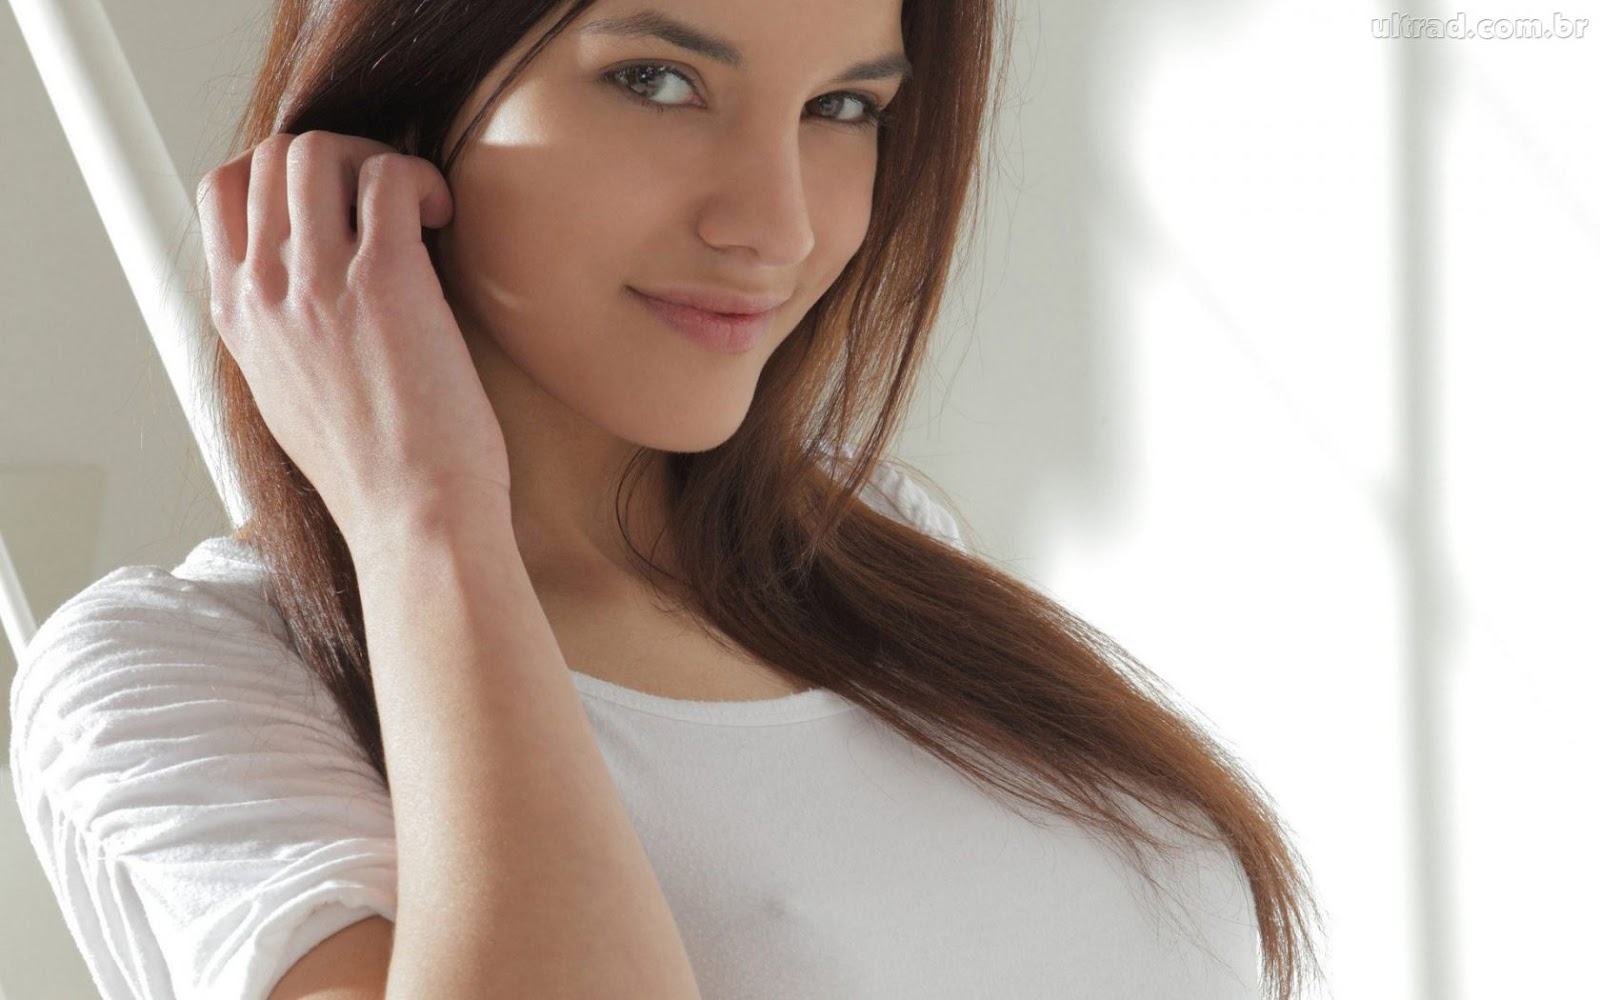 Apretado coño jodido modelos putas peruanas